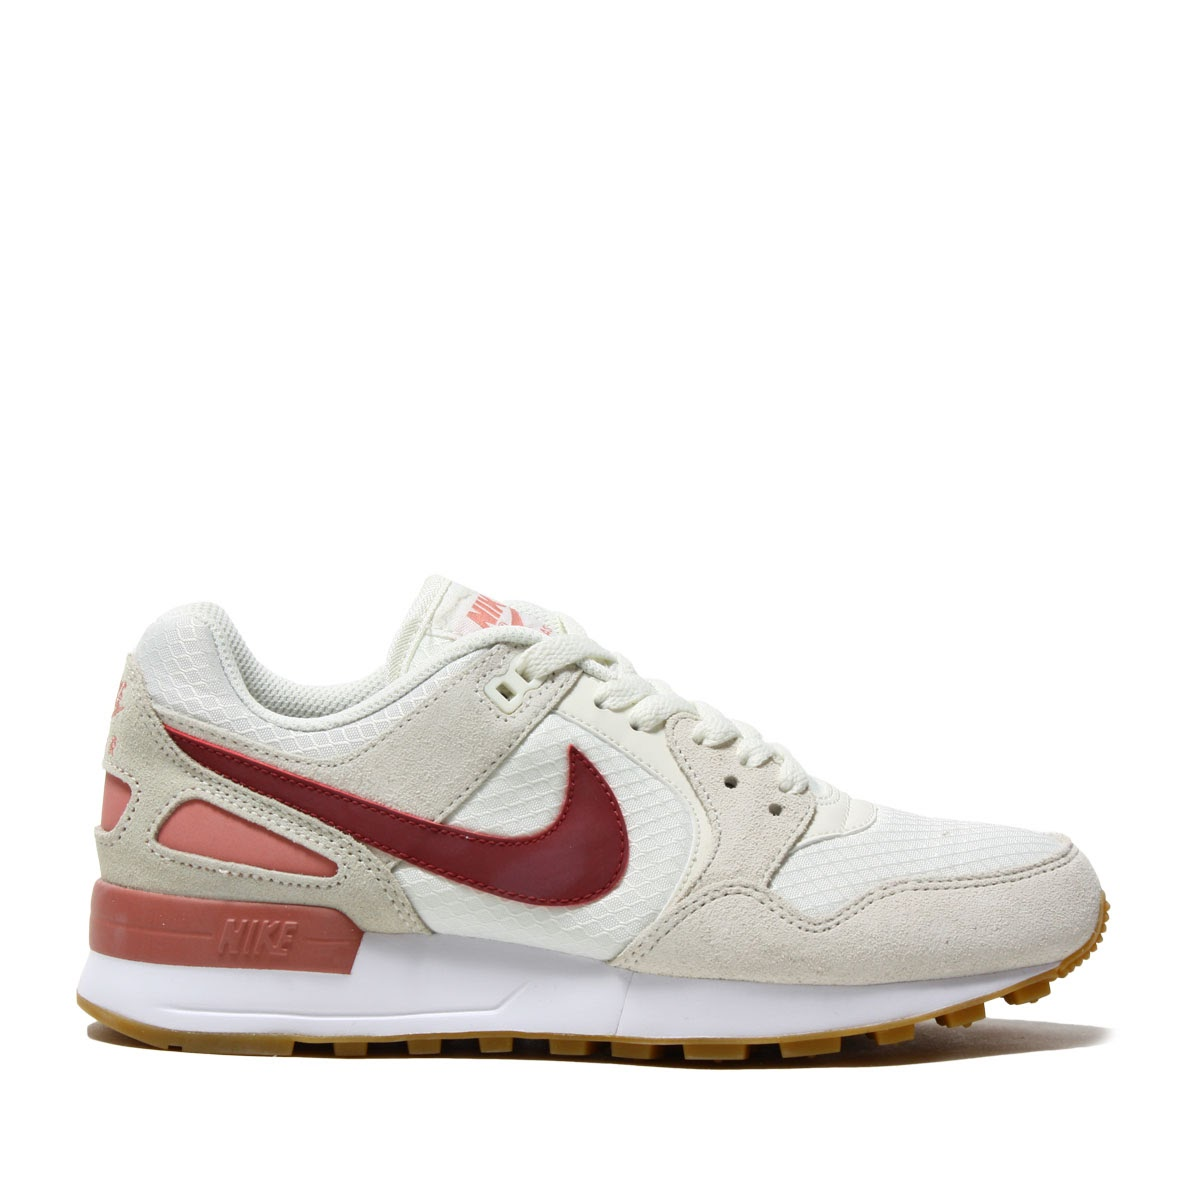 NIKE W AIR PEGASUS '89 (Nike women air Pegasus 89) SAIL/PORT-RED STARDUST-GUM  LIGHT BROWN 17FA-I